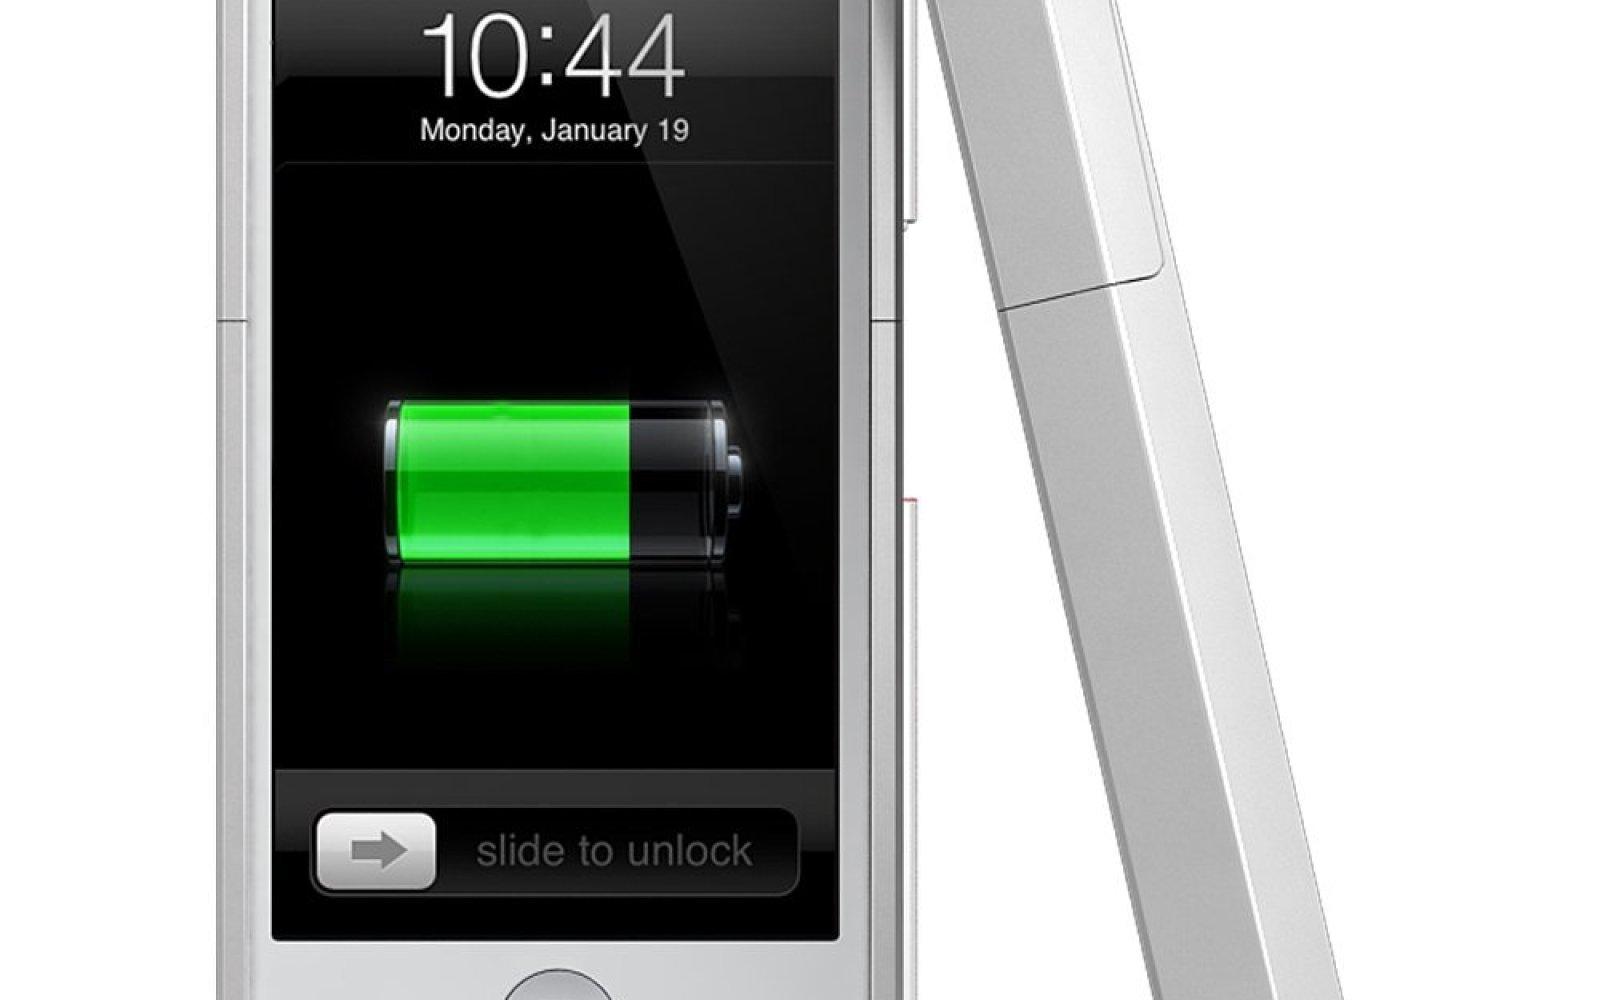 uNu DX iPhone 5/5s 2300mAh MFi Protective Battery Case (white): $50 shipped (Reg. $90)